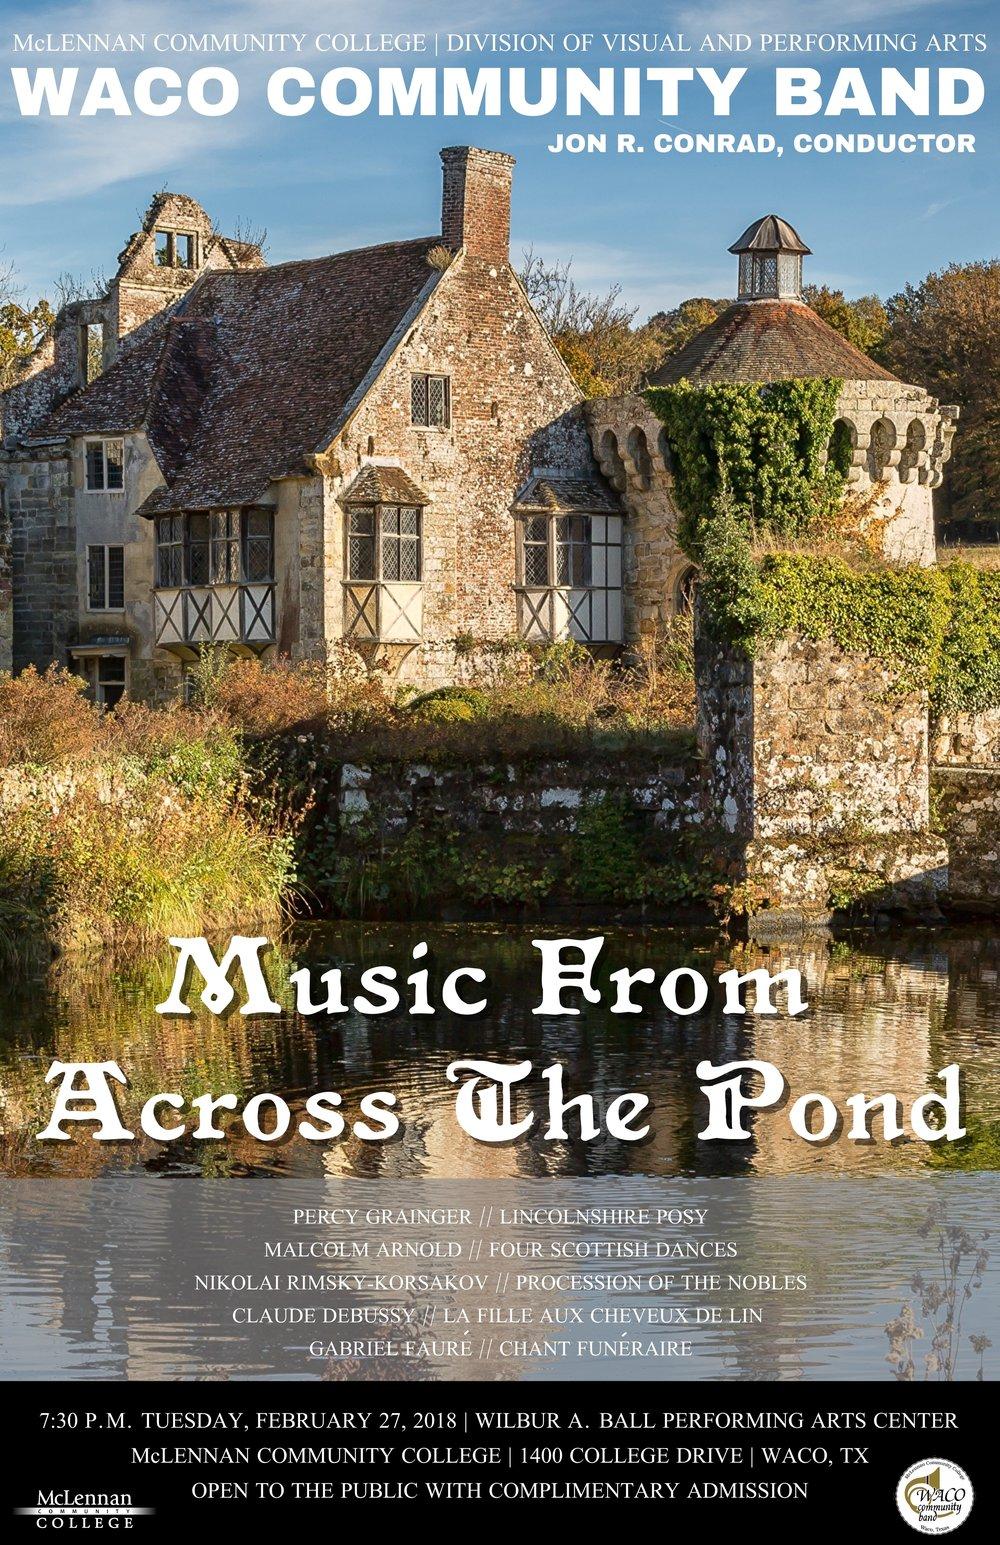 WCB_Feb_27_2018_Music_Aross_Pond.jpg